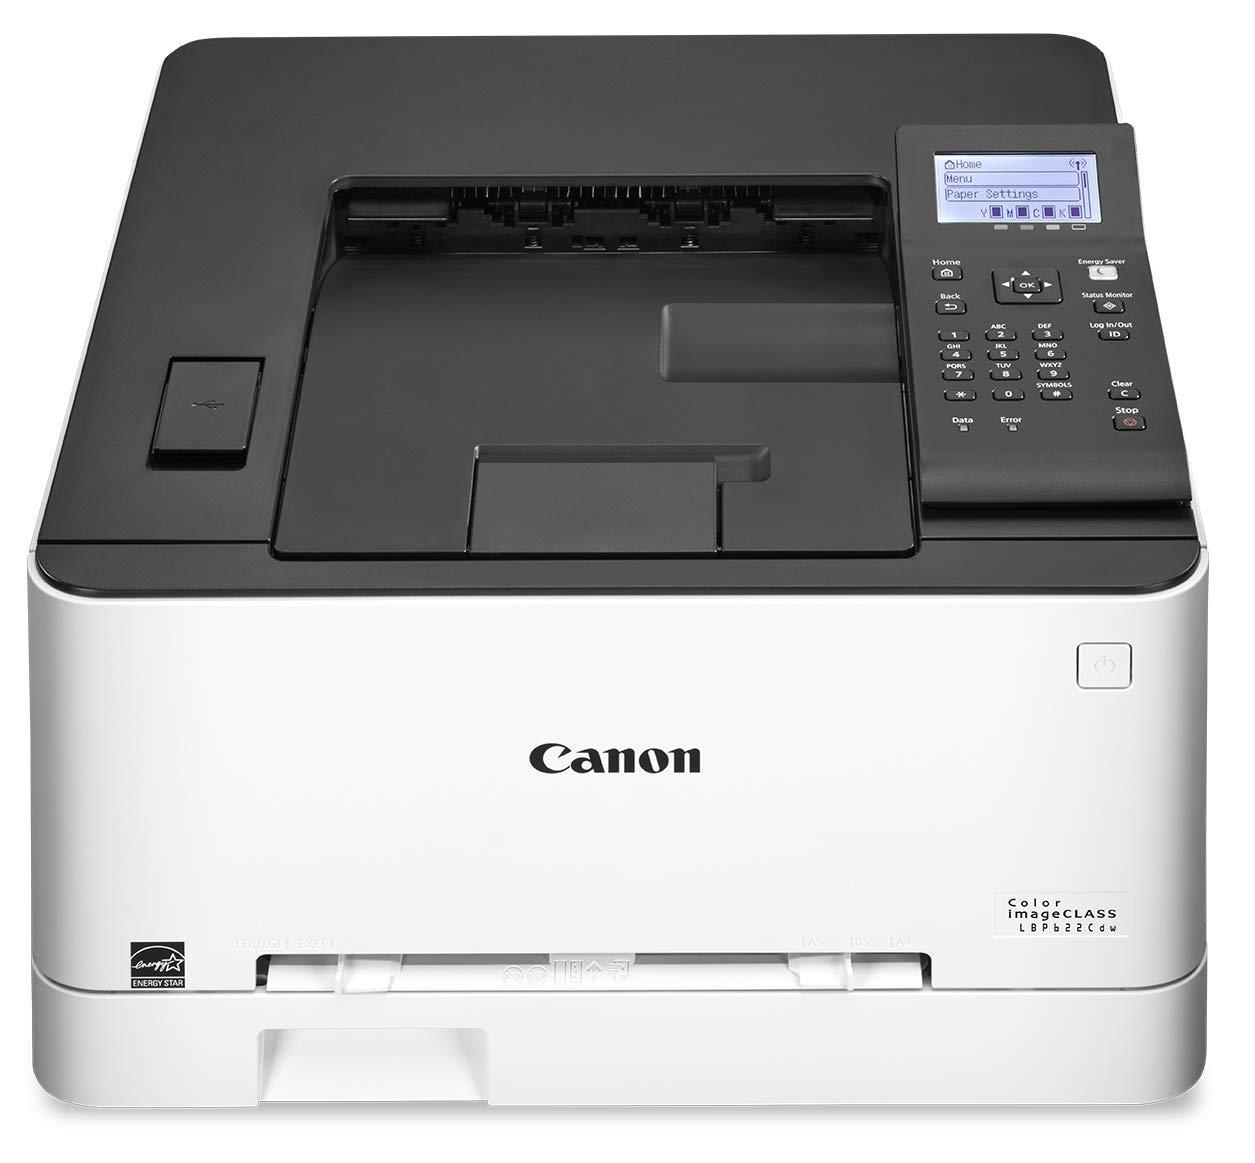 Canon imageCLASS LBP622Cdw Wireless Printer